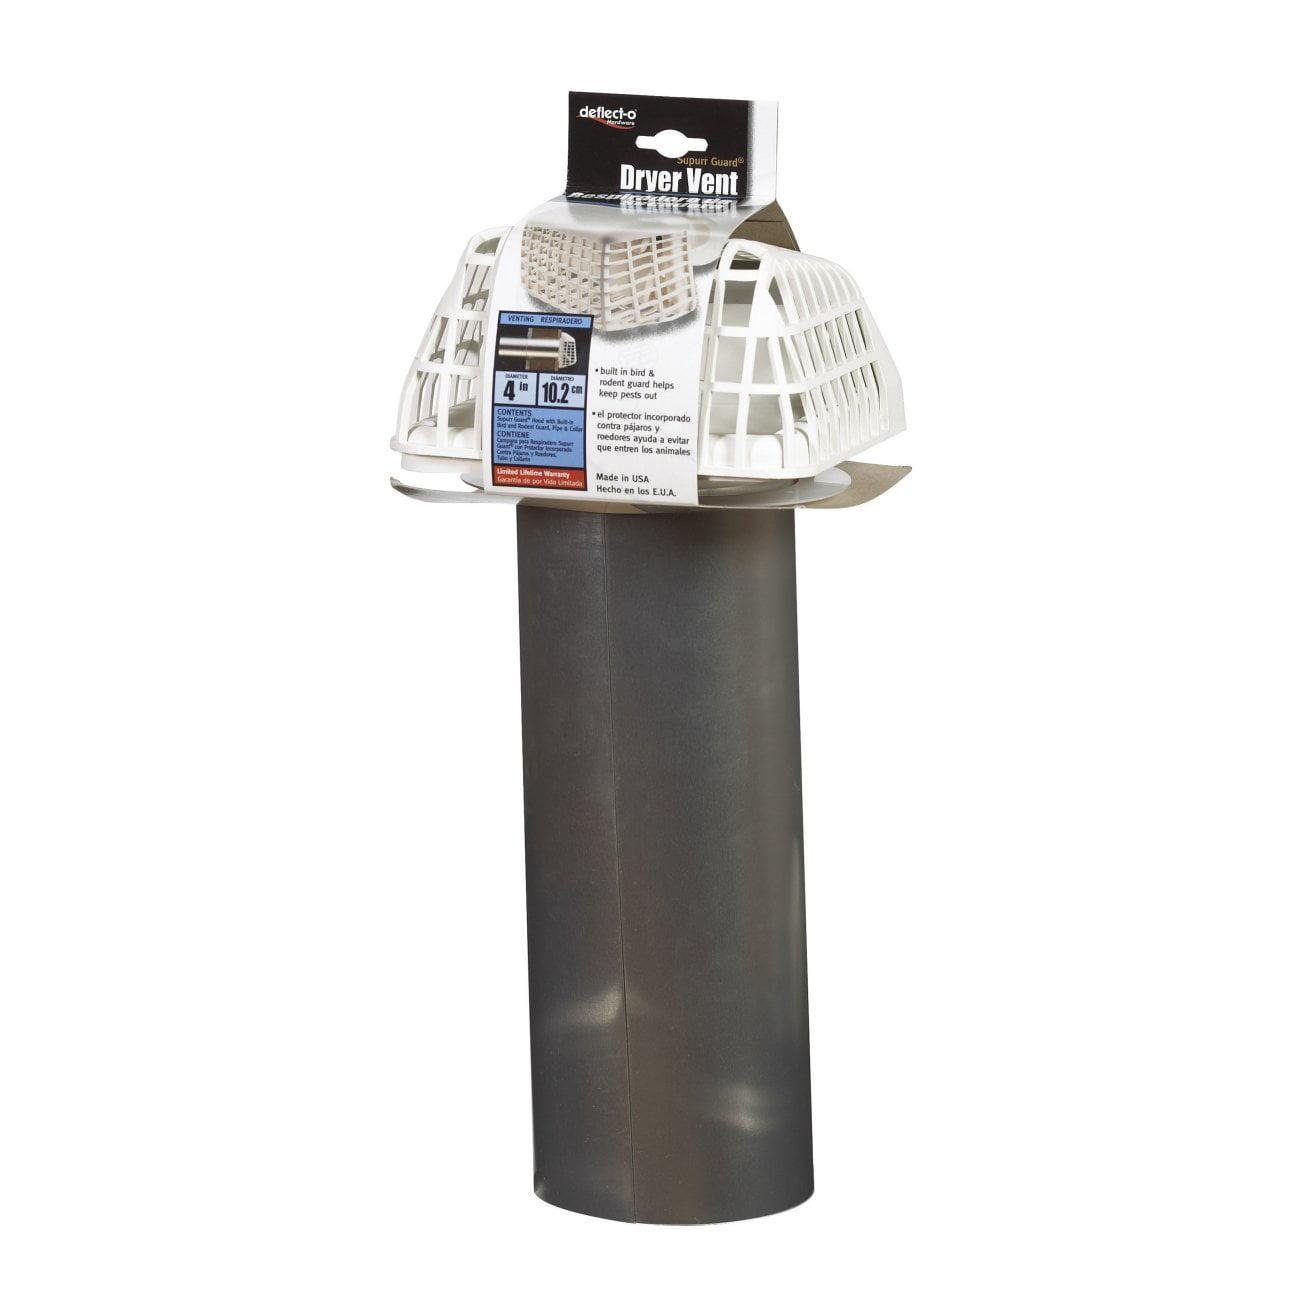 Deflect O Gvhxw4 Supurr Guard Dryer Vent Hood 4 Quot White